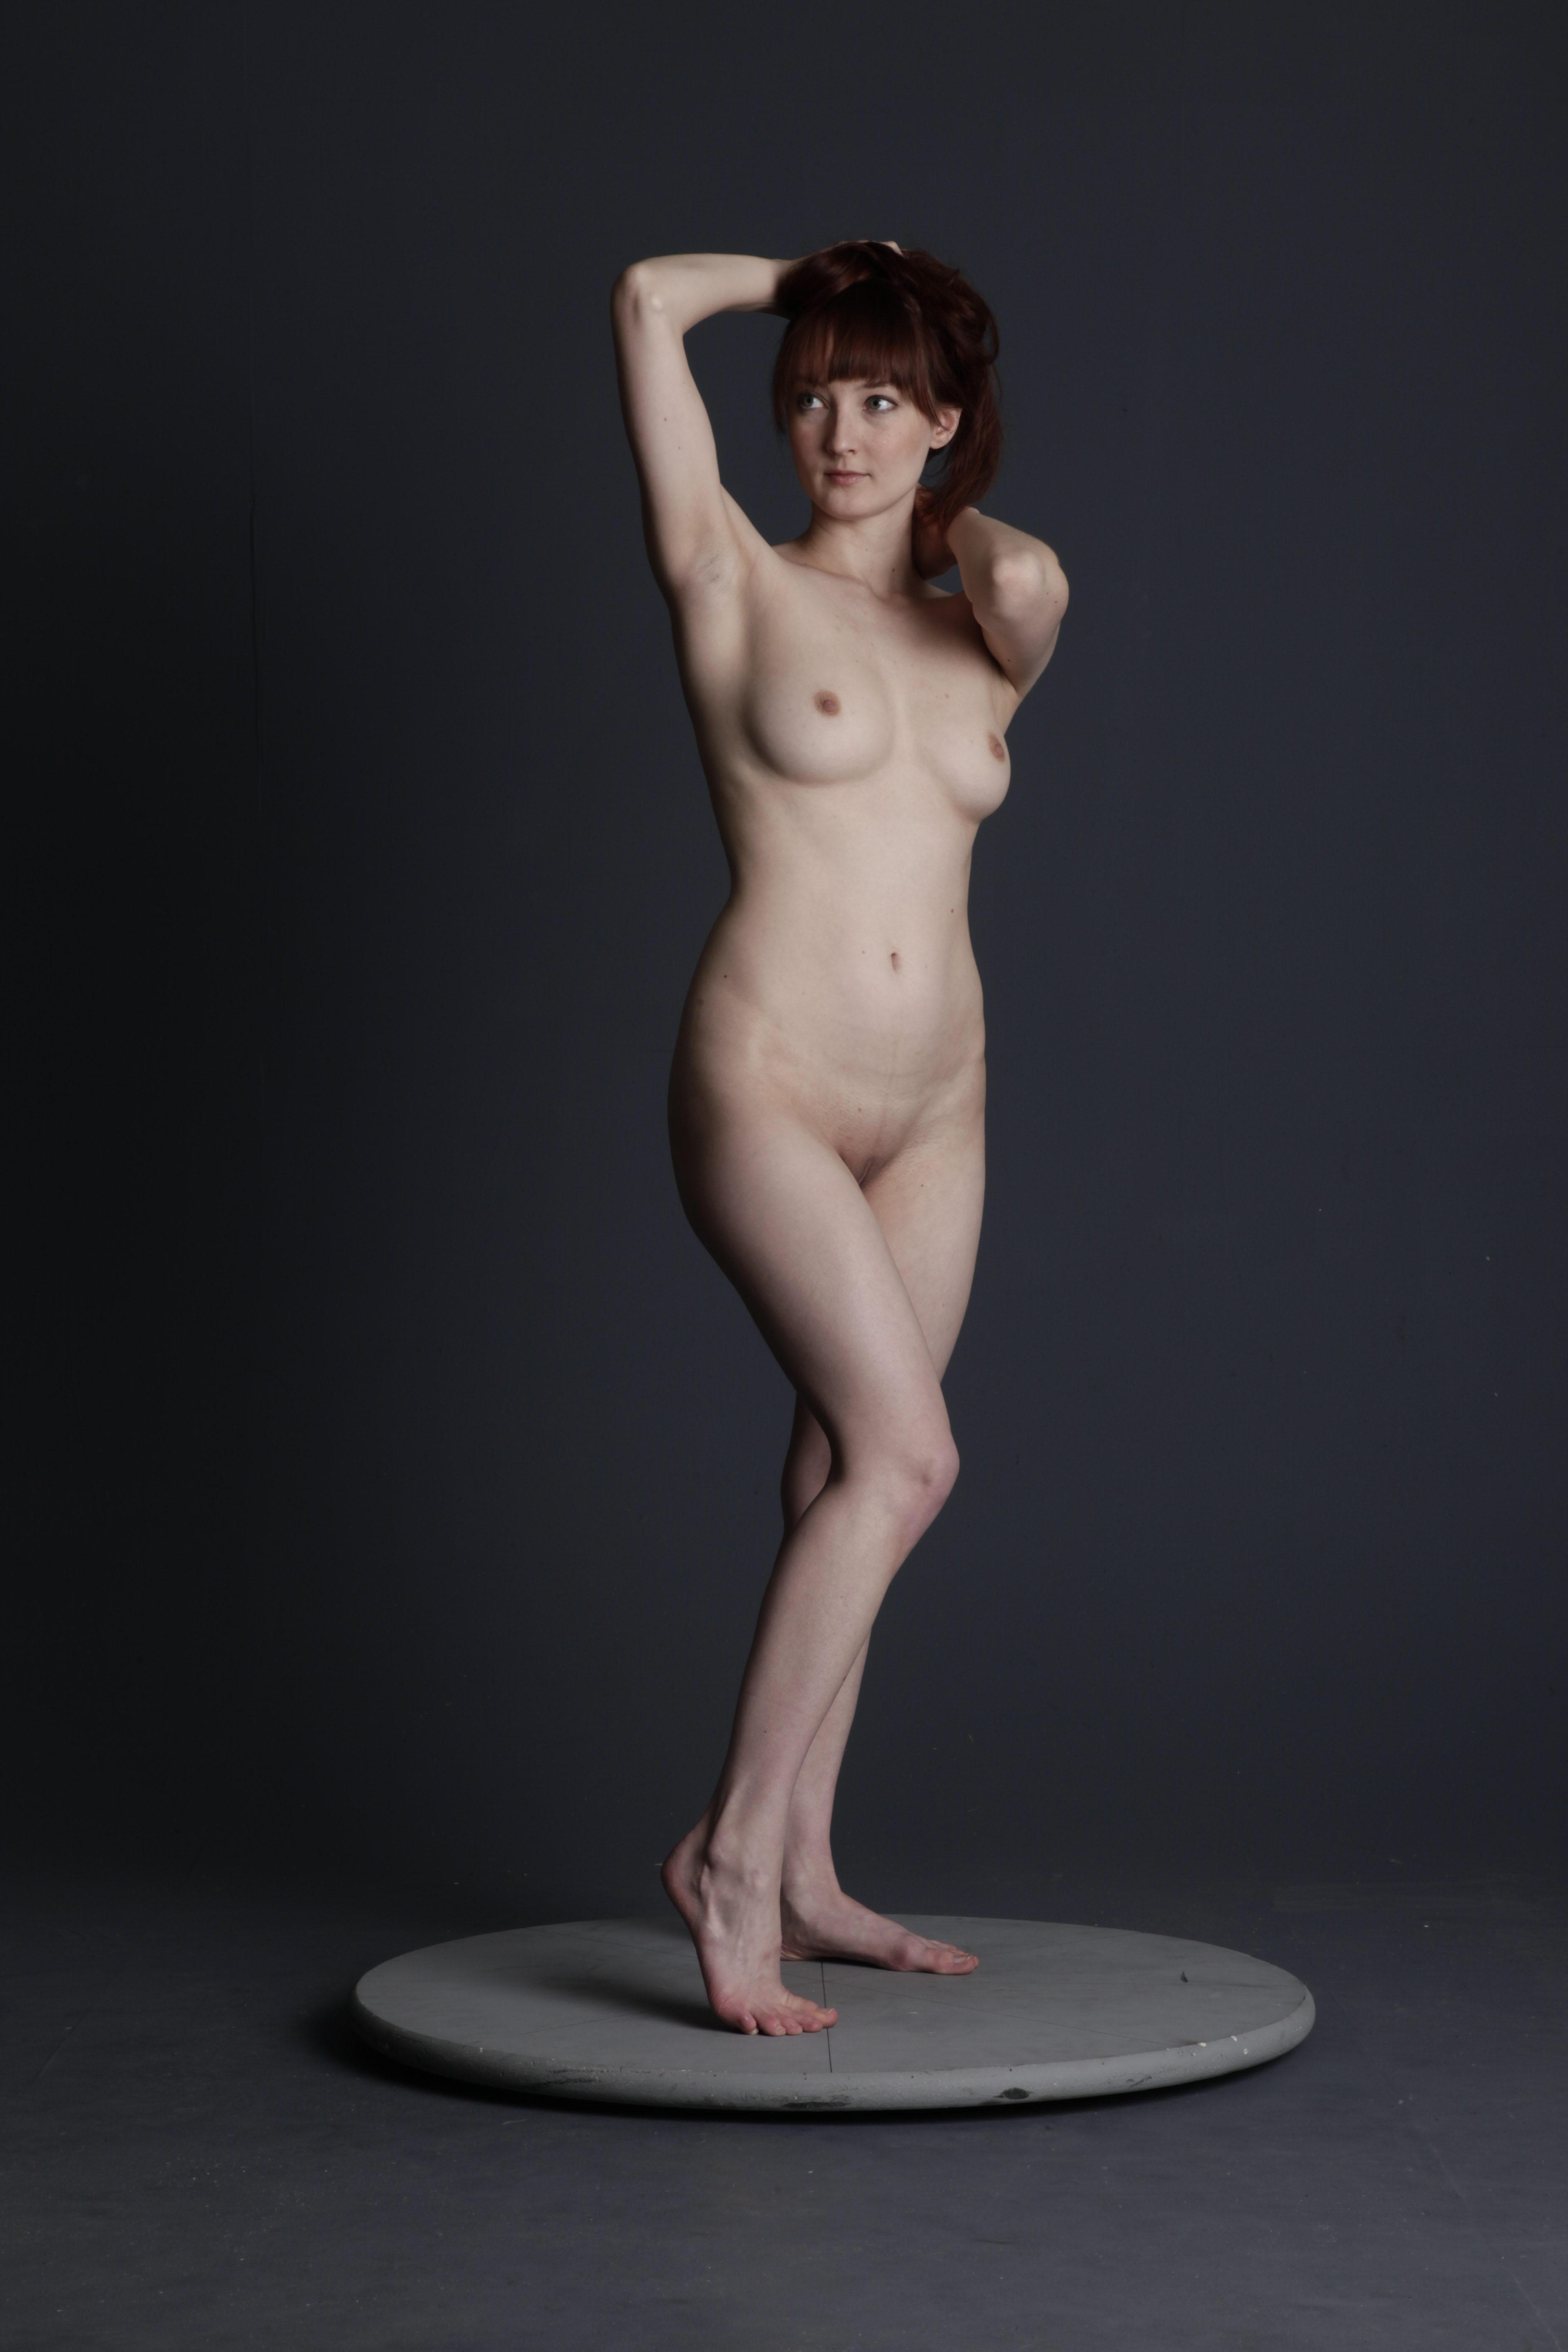 Human Anatomy Art & Framed Artwork Zazzle